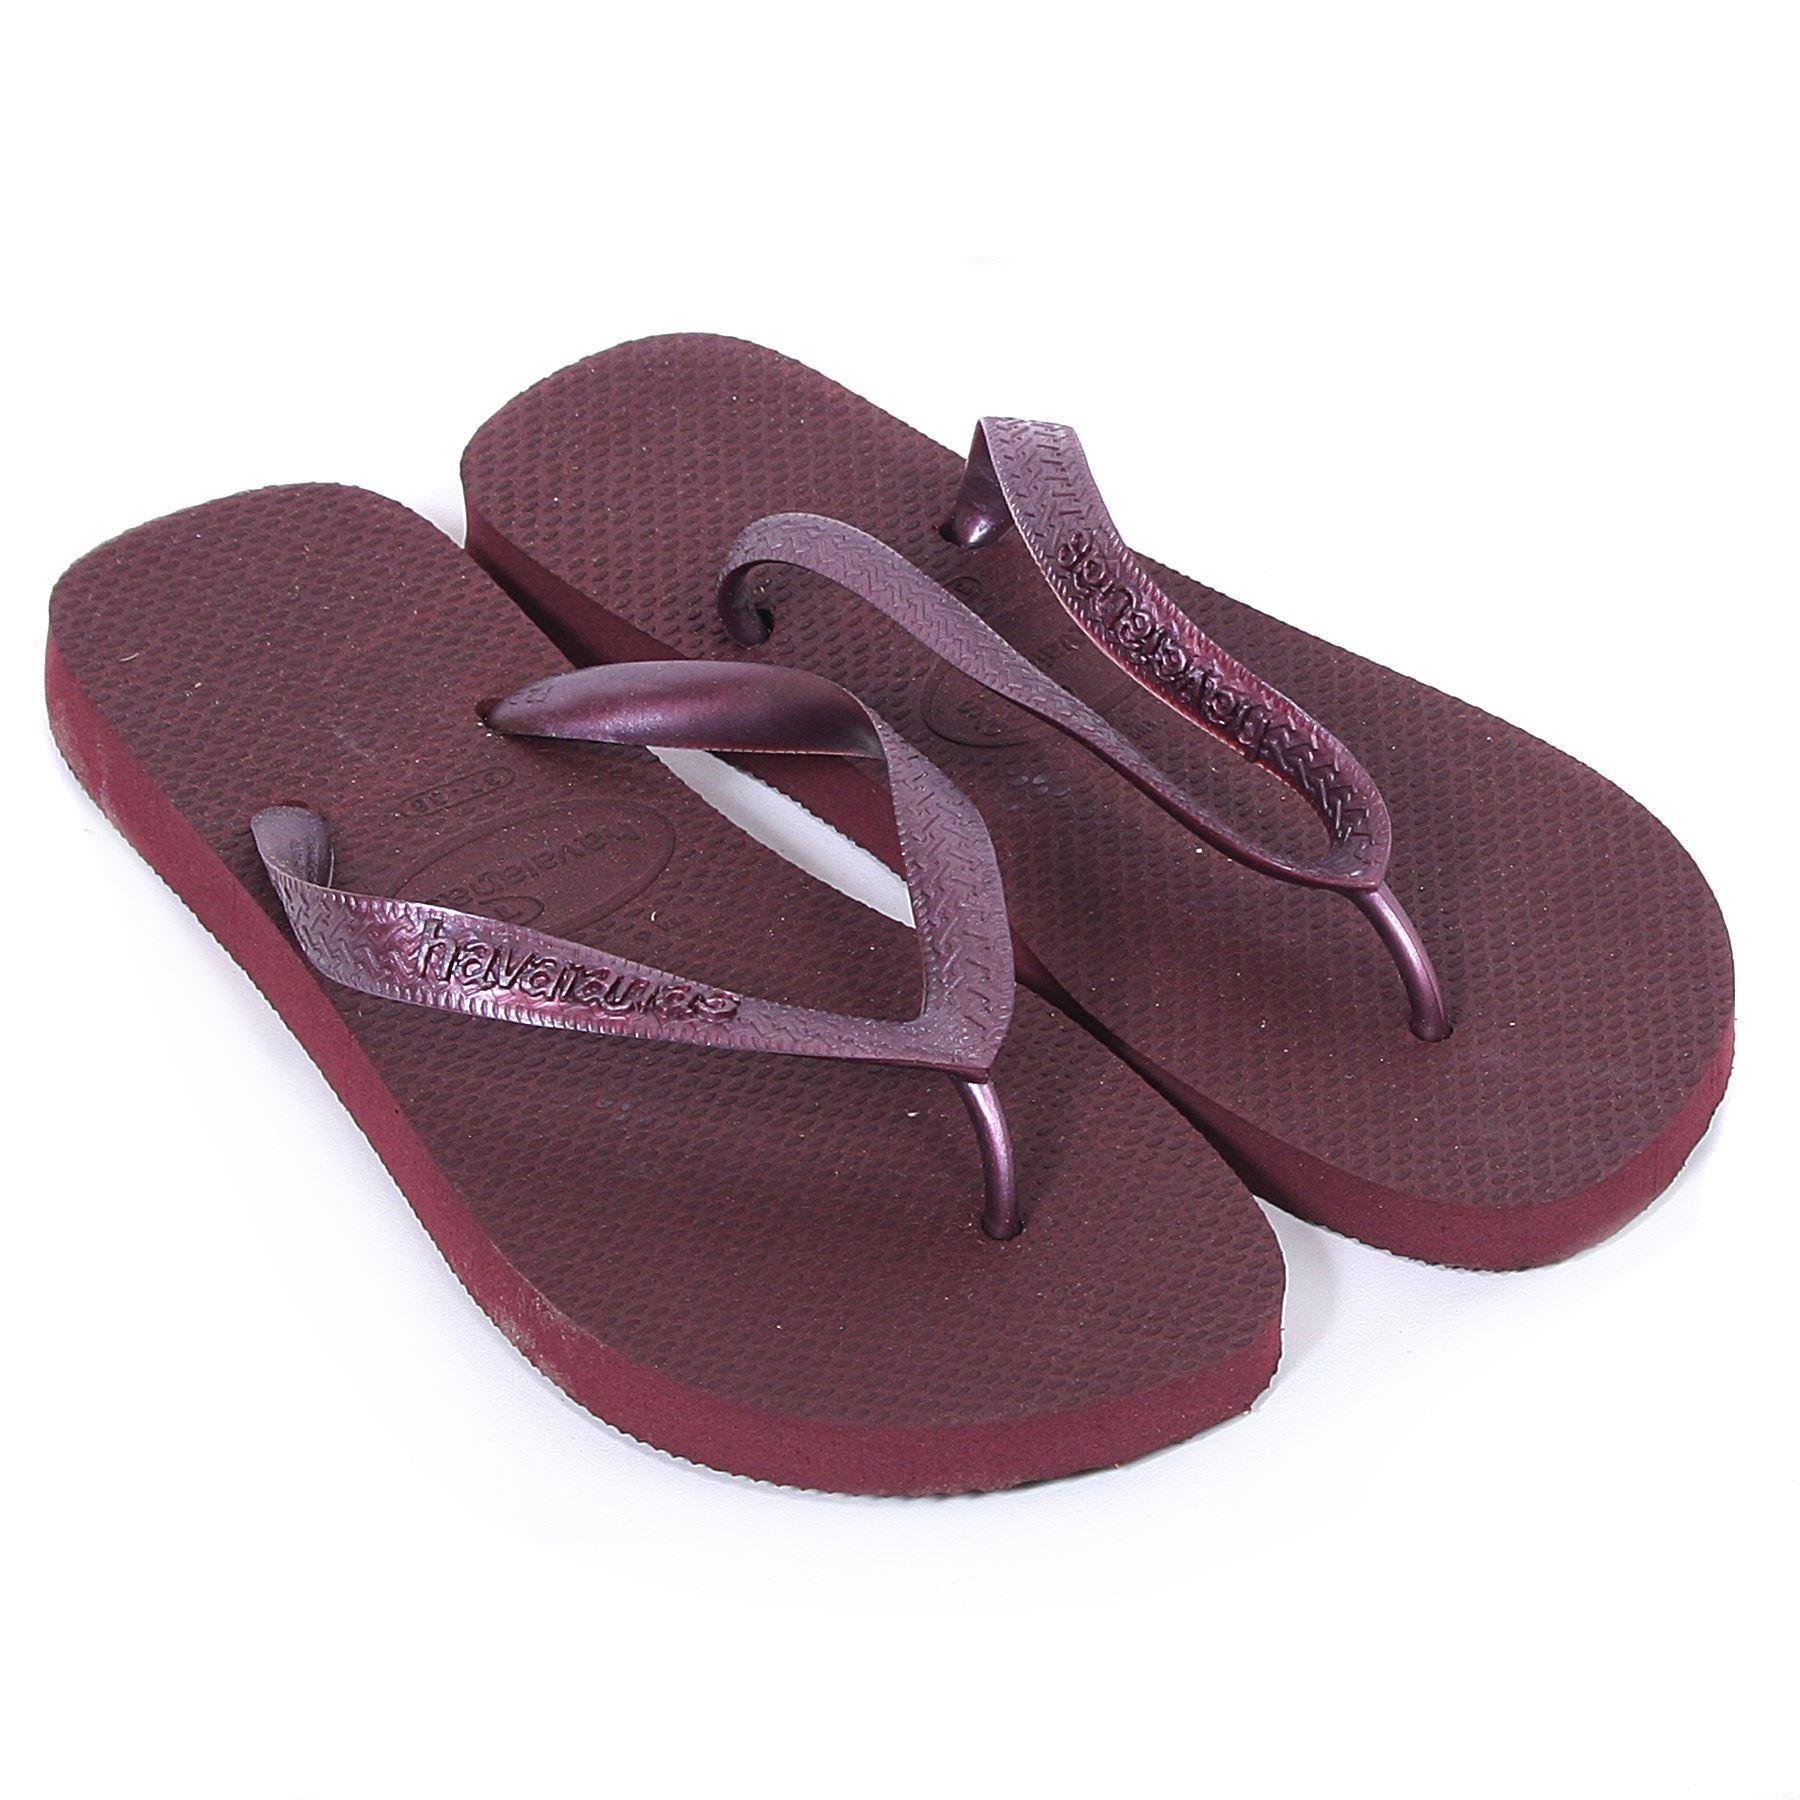 havaianas slim brazil 2017 women 39 s flip flops original sandal vary colors size ebay. Black Bedroom Furniture Sets. Home Design Ideas